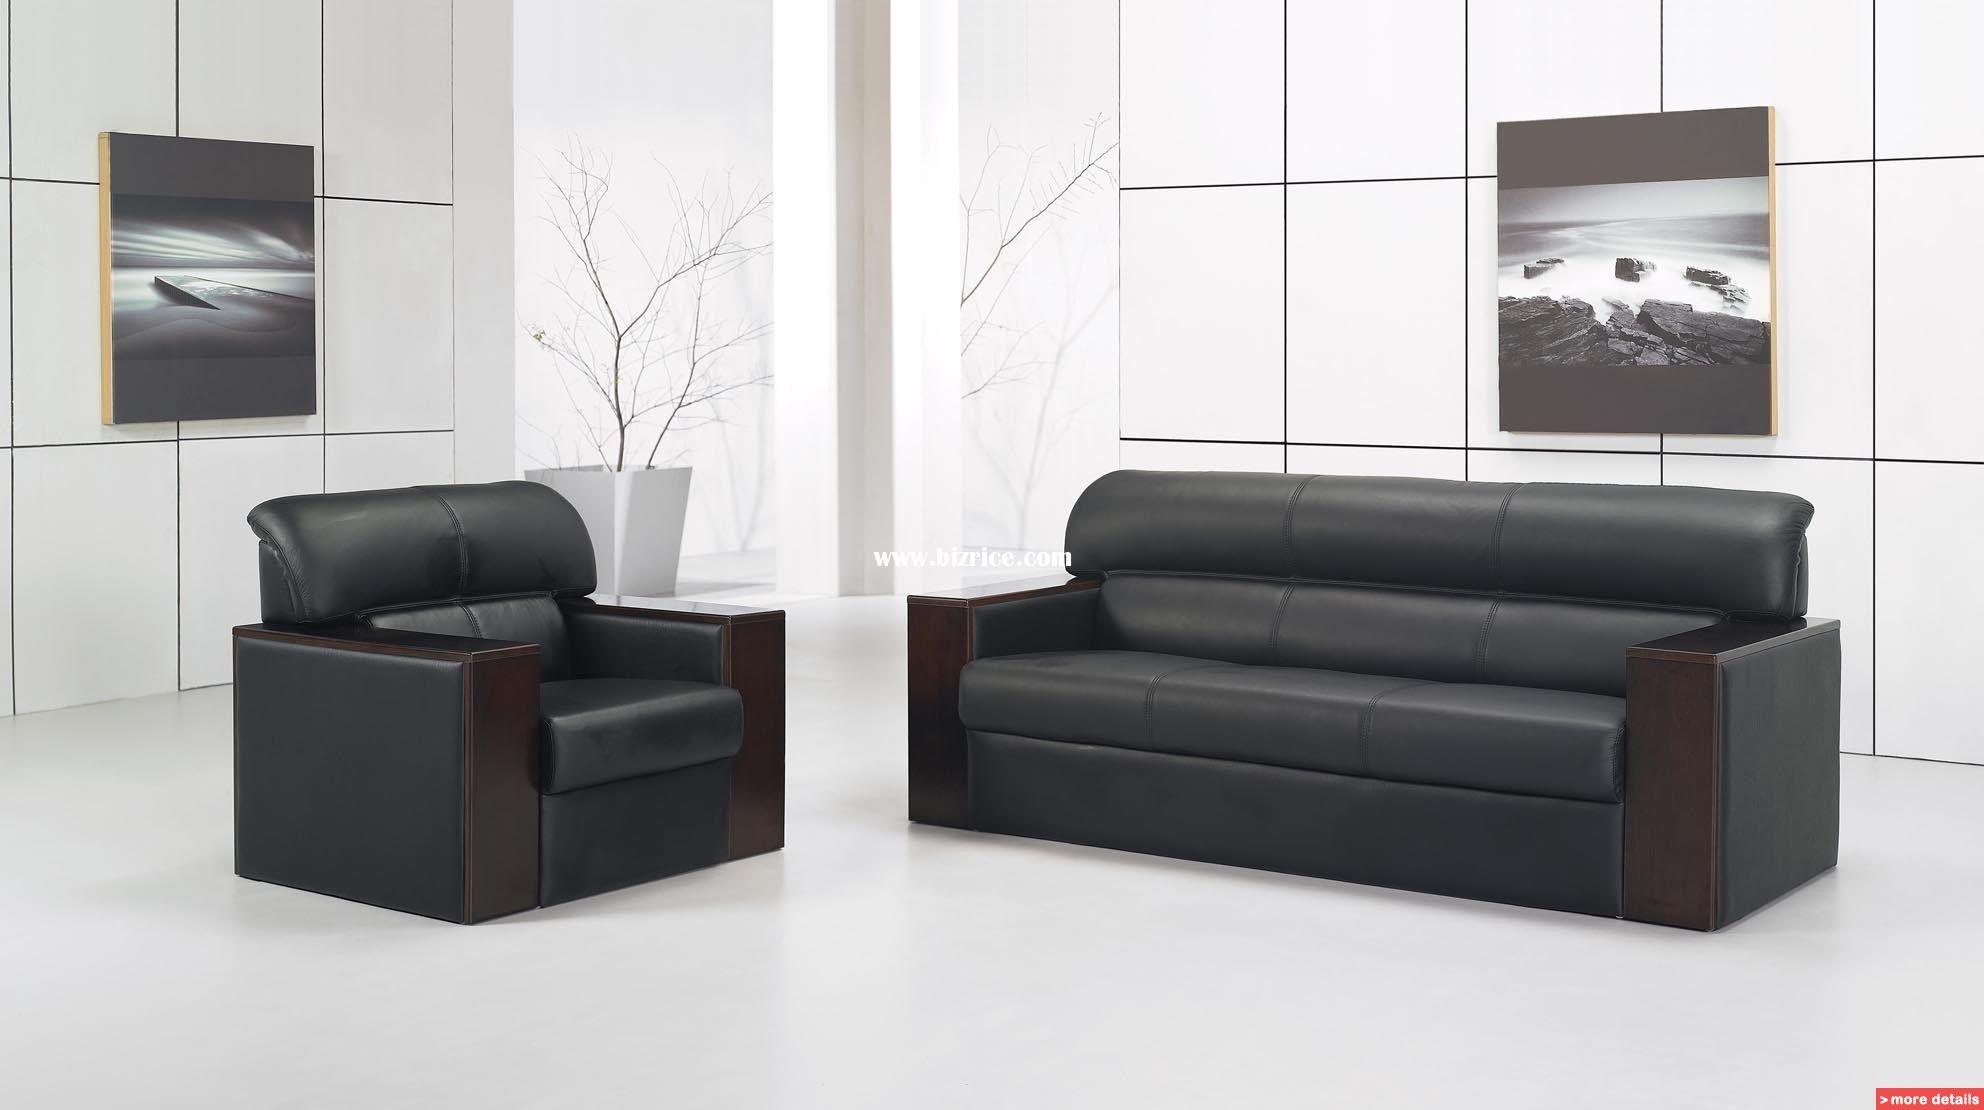 16 Reception Fice Furniture Office Sofa Furniture Sofa Furniture